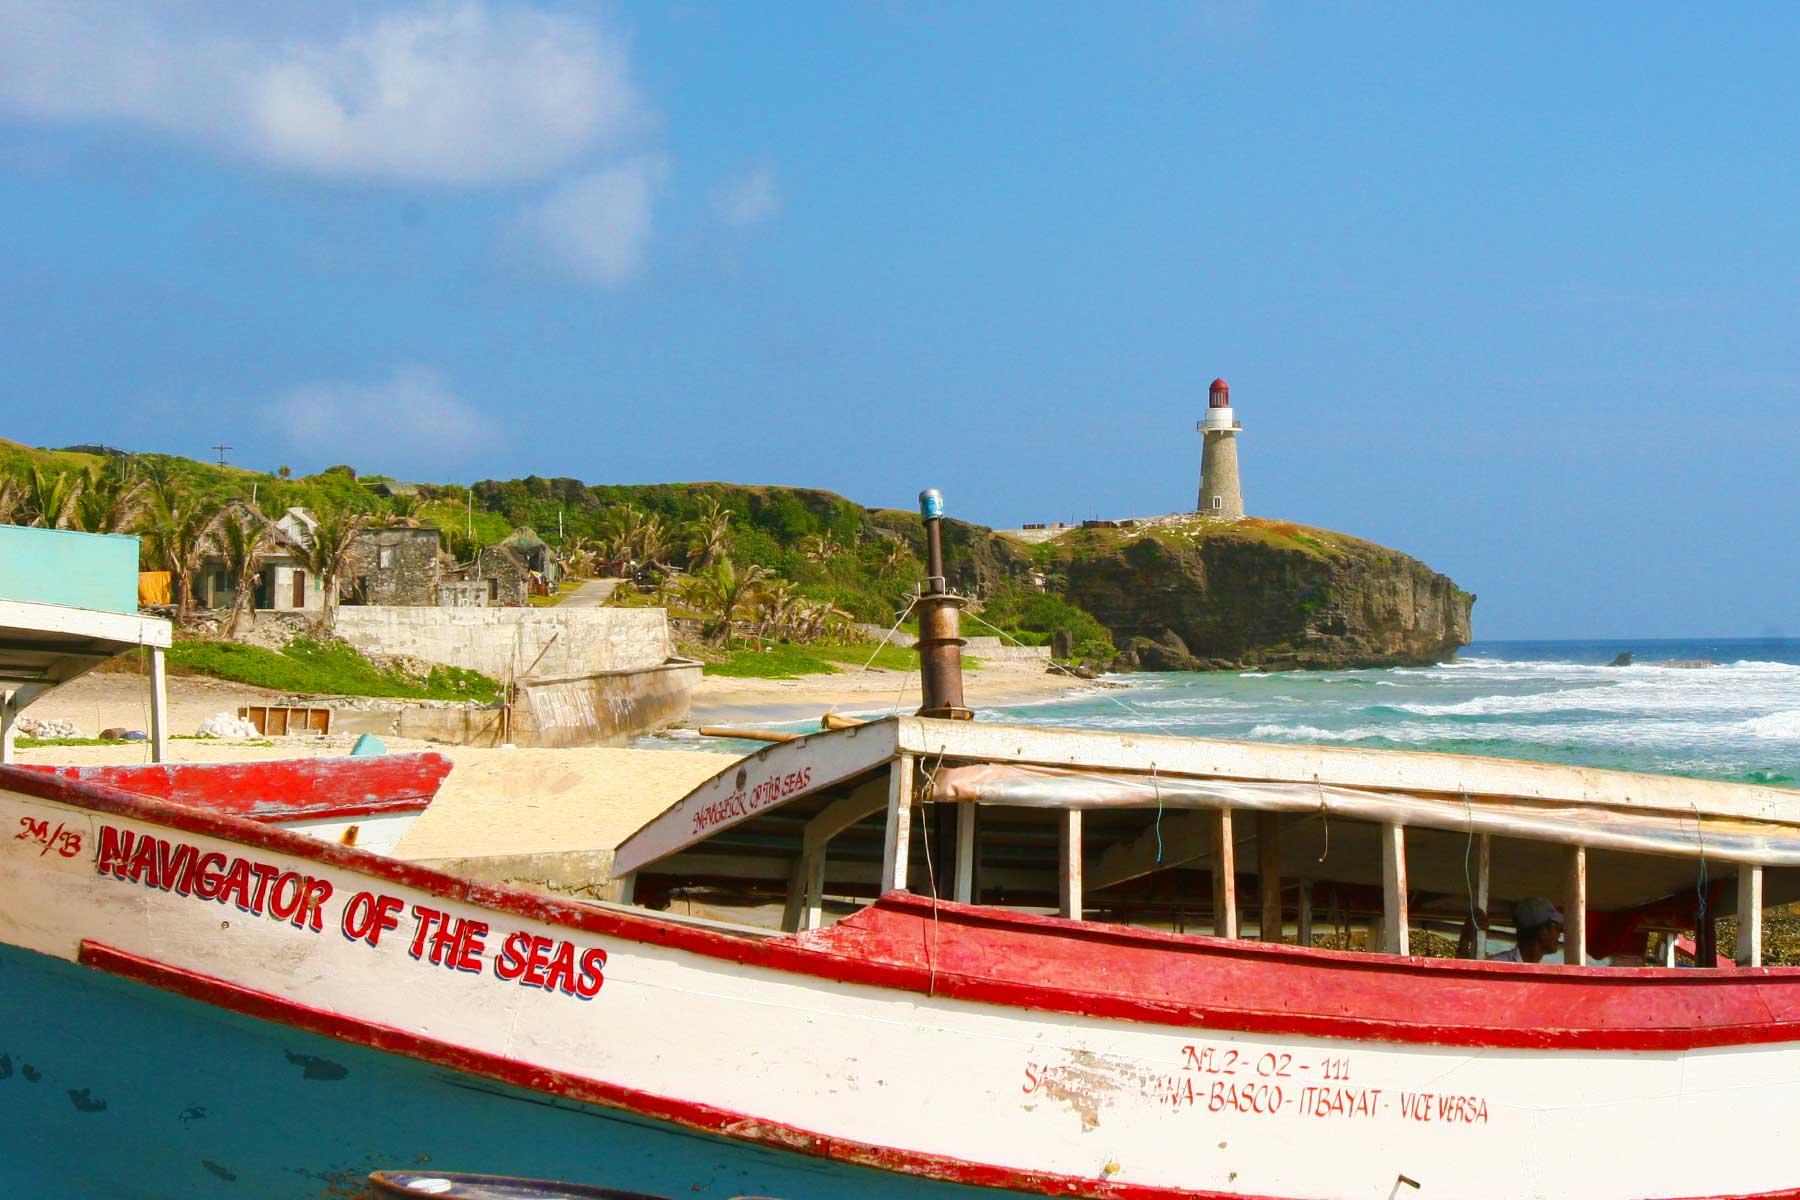 Sabtang Lighthouse - Batanes Islands Photo Journal - Ivatan Boat House - San Vicente - Austronesian Studies - Dr Steven Andrew Martin